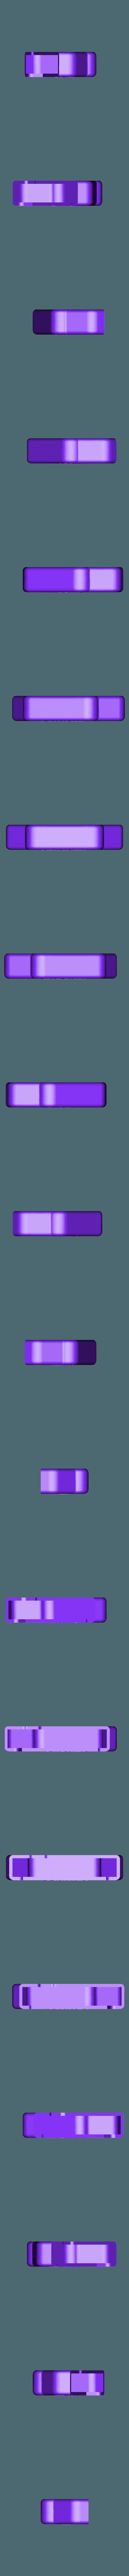 DX Handle v1 v36.stl Download STL file Arduino RaspBerry Pi Rasbian On Site Programmer • 3D printer template, nik101968